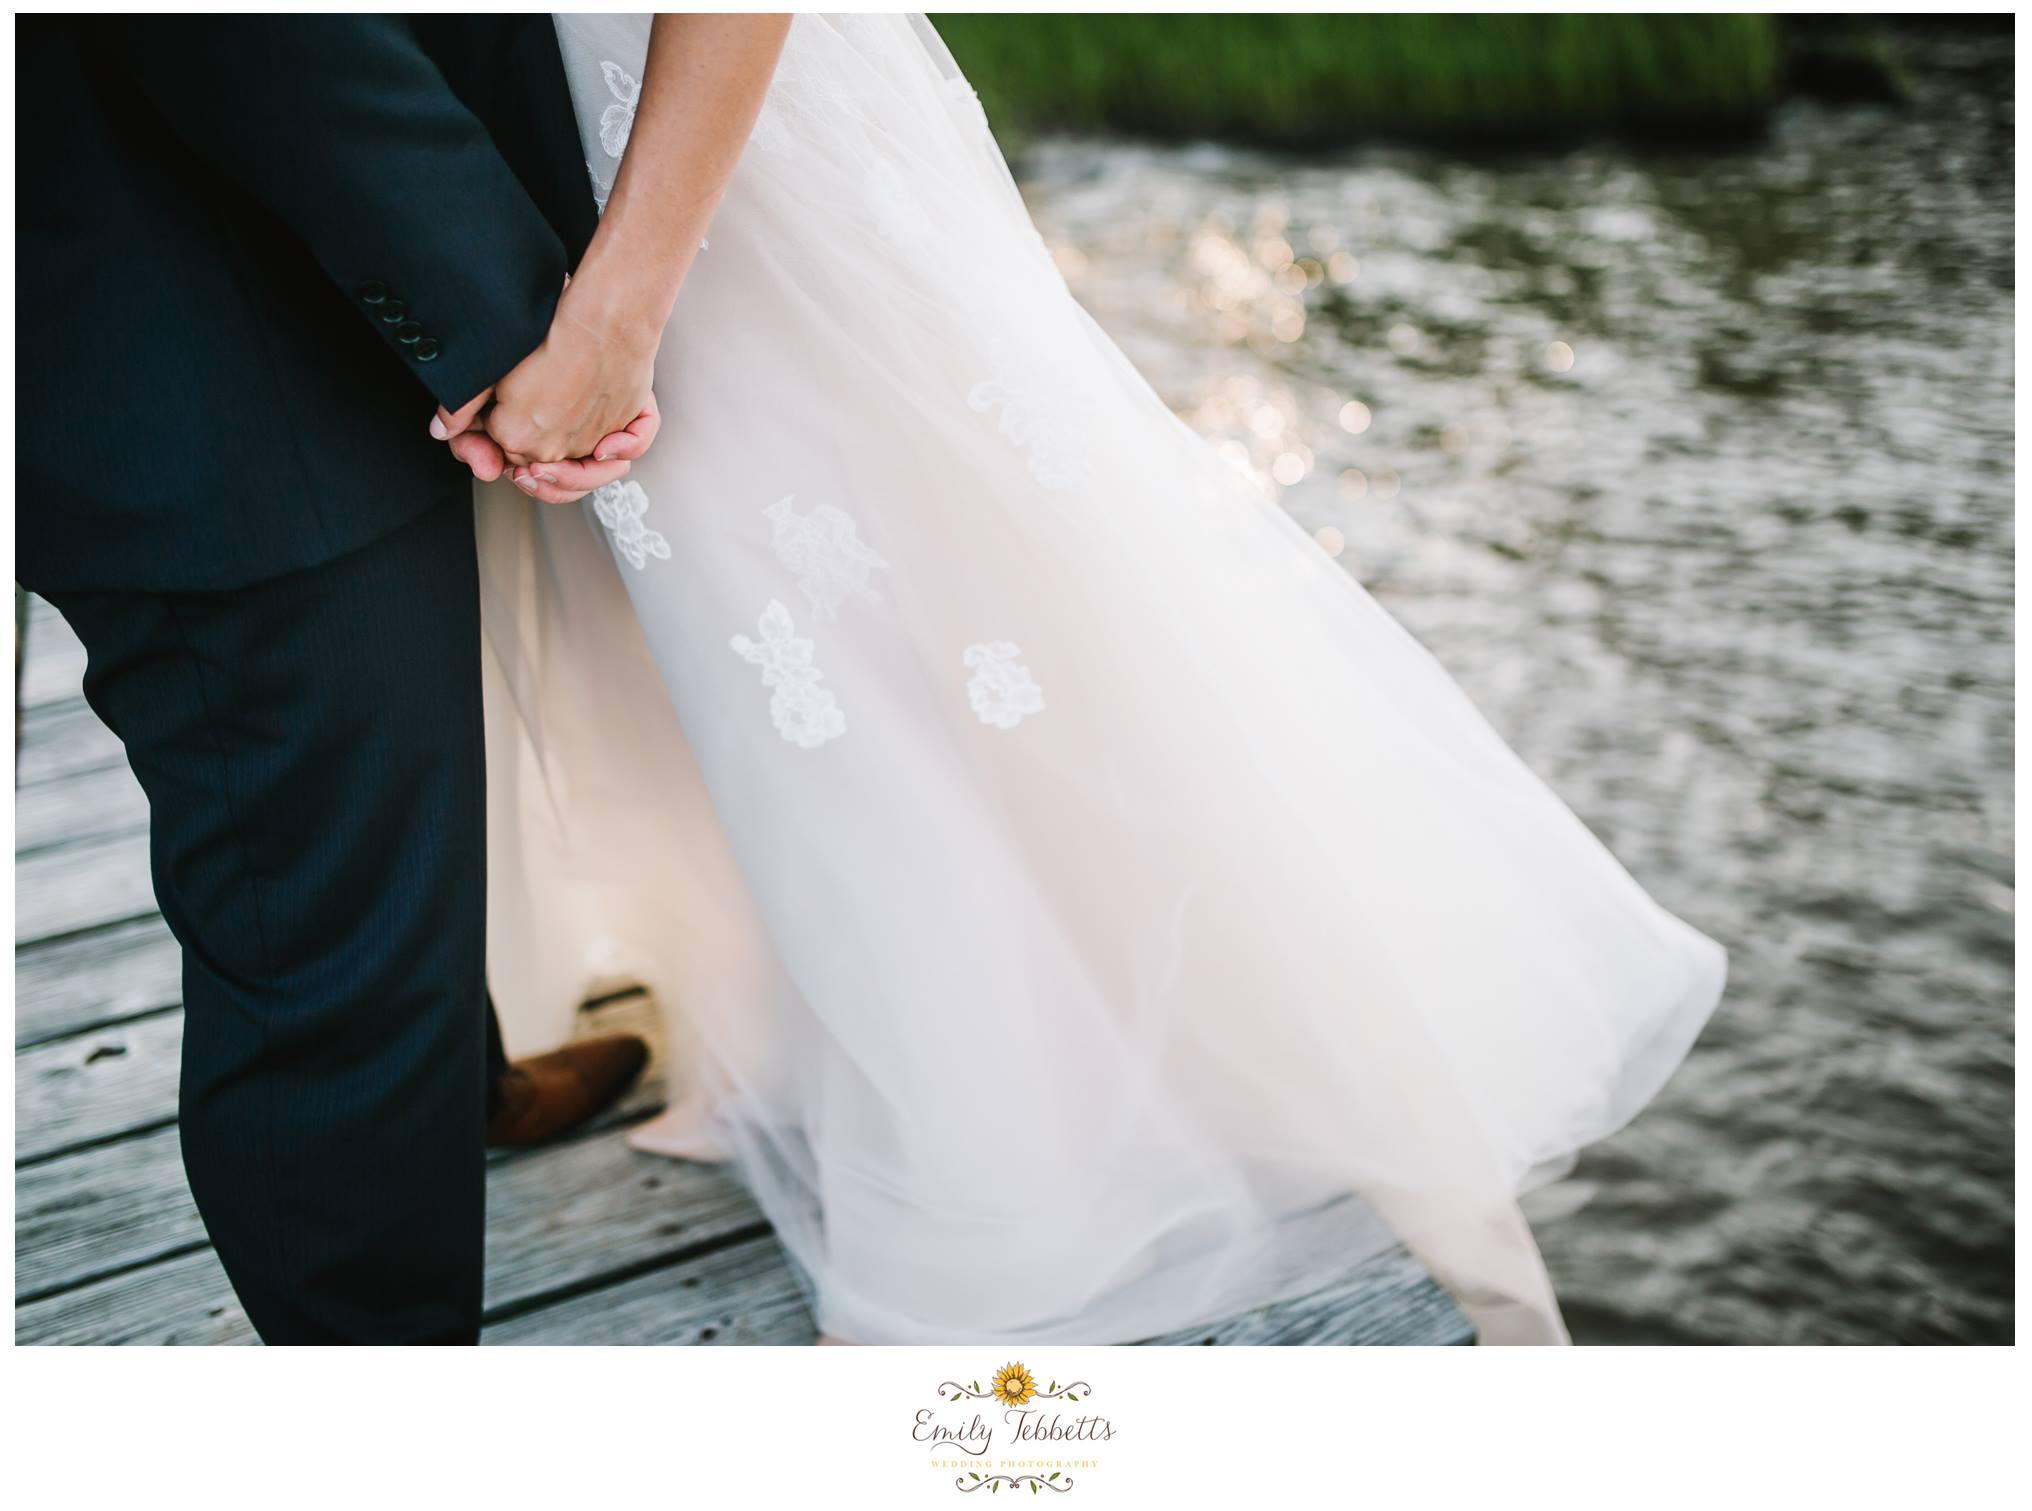 Emily Tebbetts Photography Wedding || Private Residence : Dauntless Club, Essex, CT 7.jpg